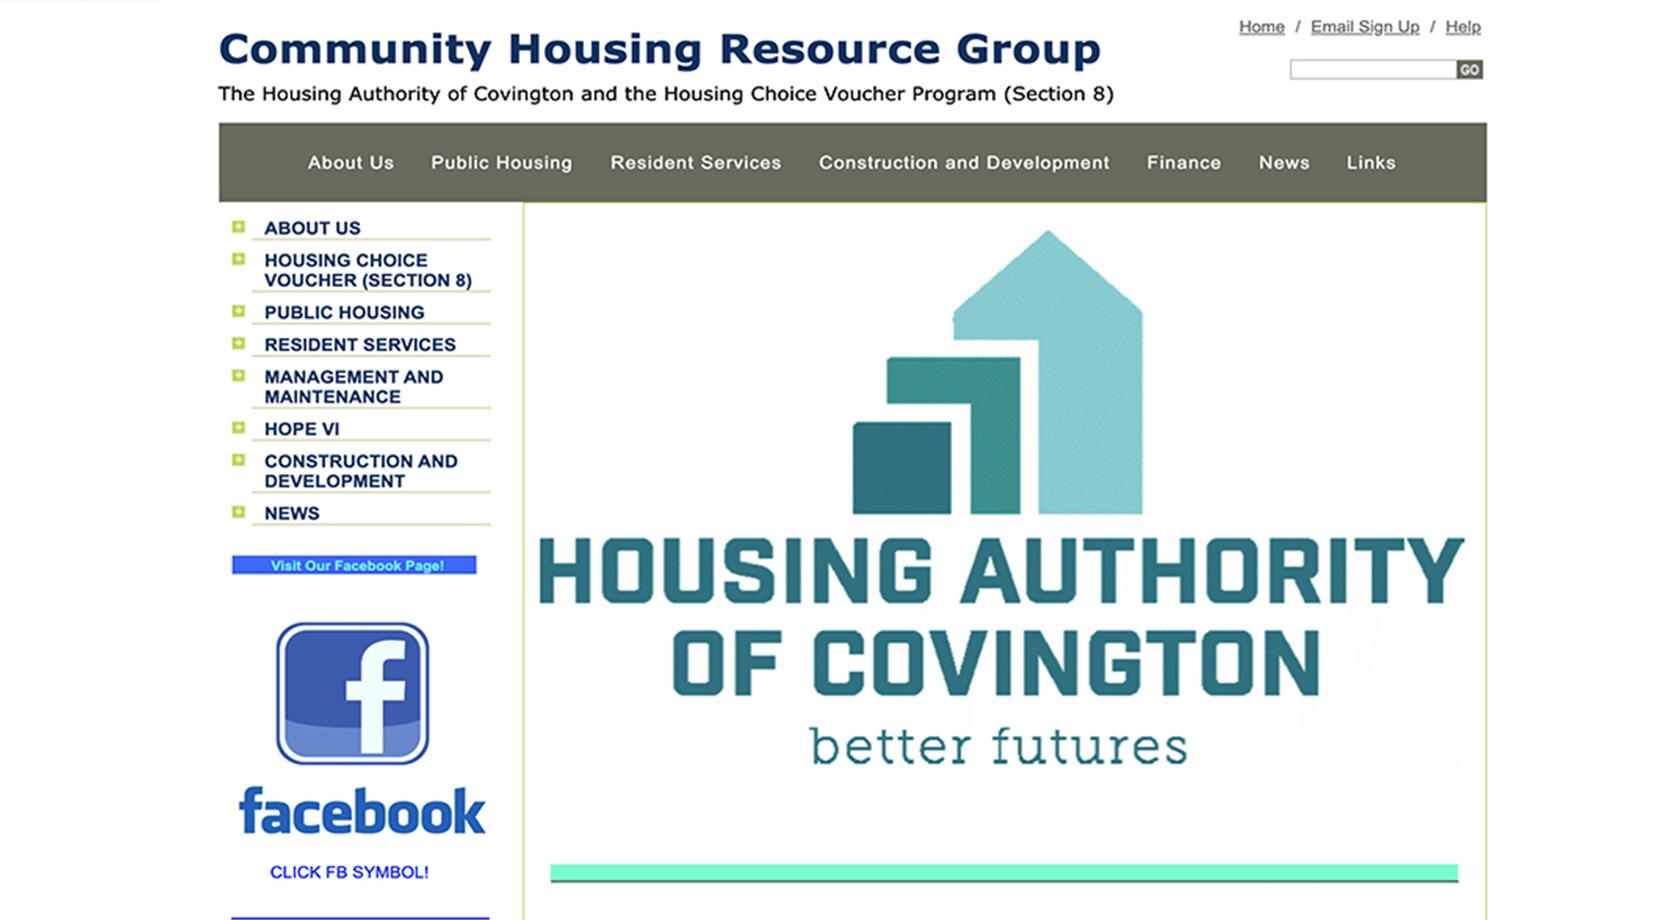 Housing authority of covington before